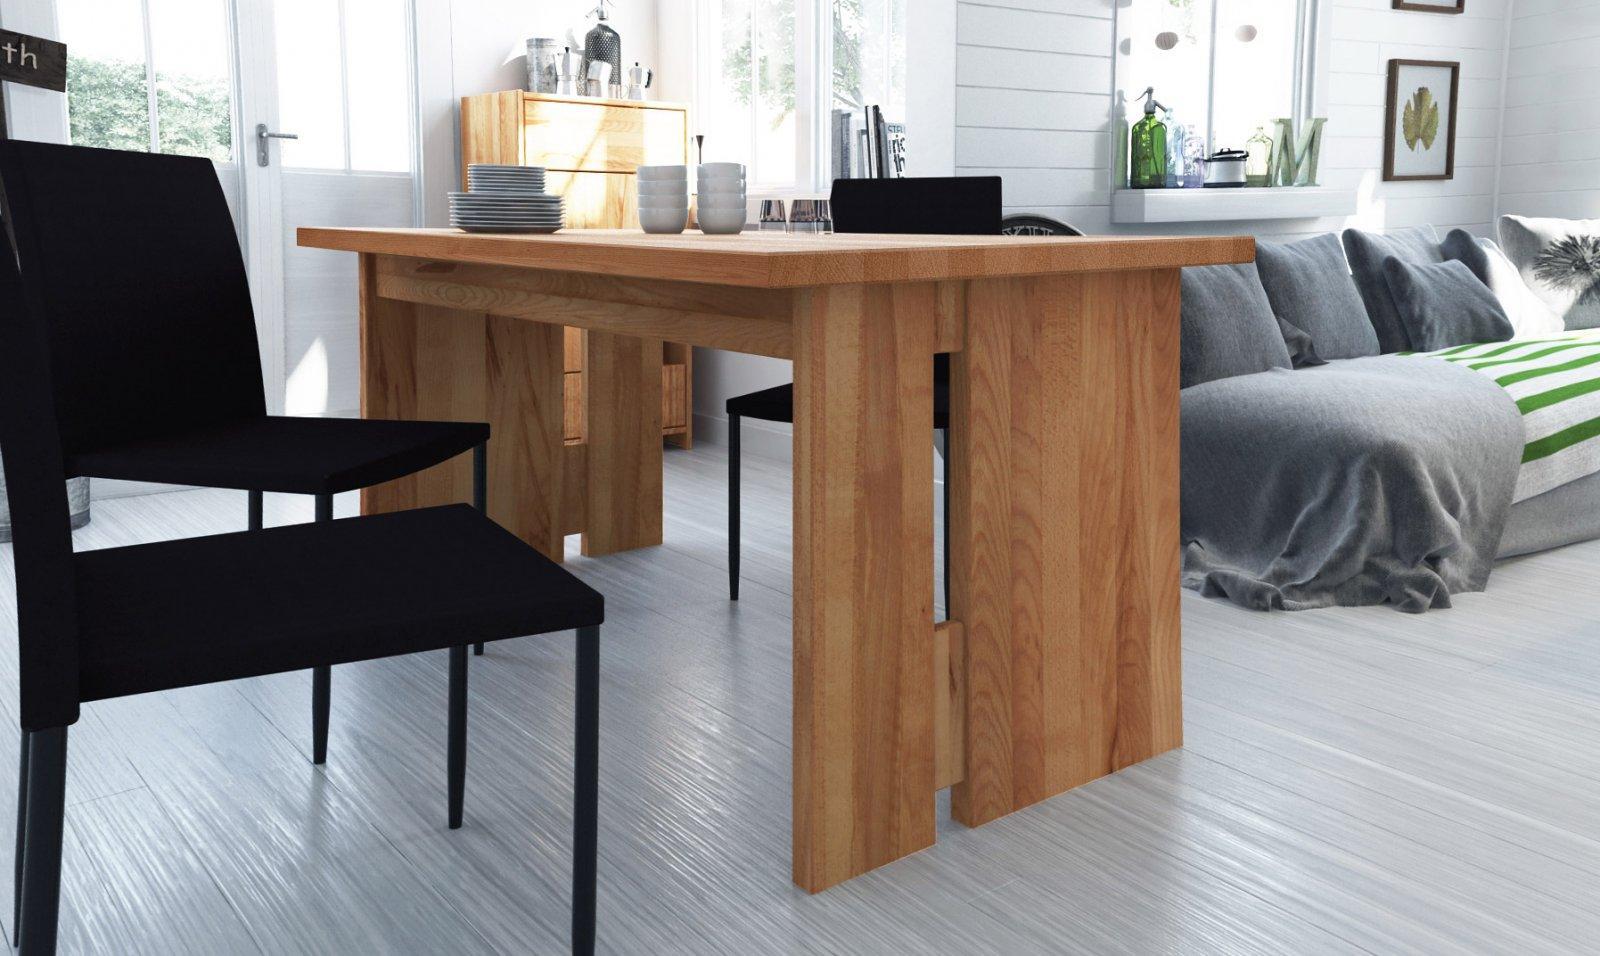 Stół VIGO rozkładany z litego drewna